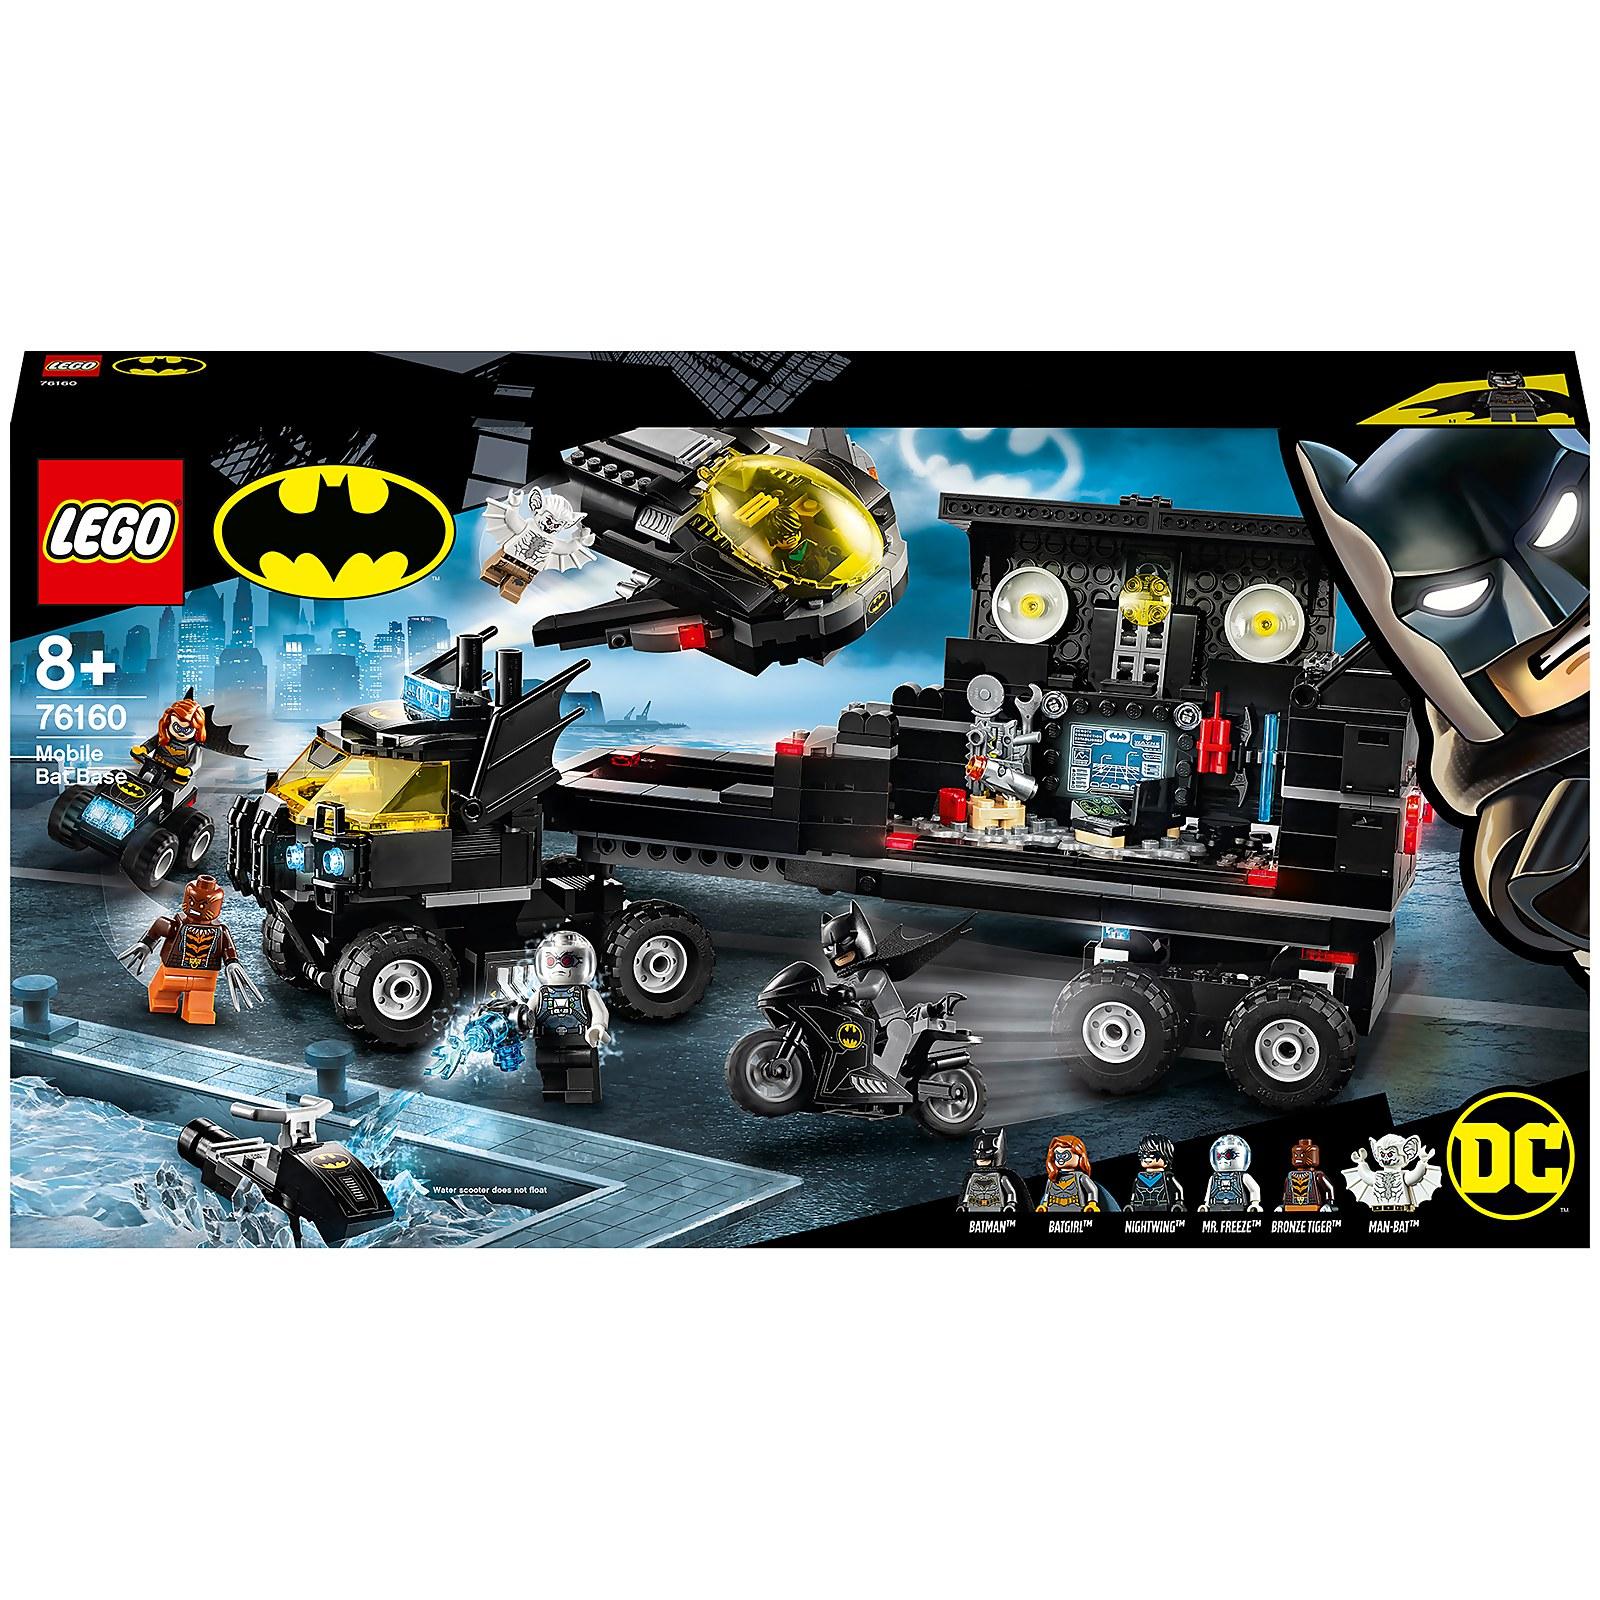 Image of 76160 LEGO® DC COMICS SUPER HEROES Mobile Batbase